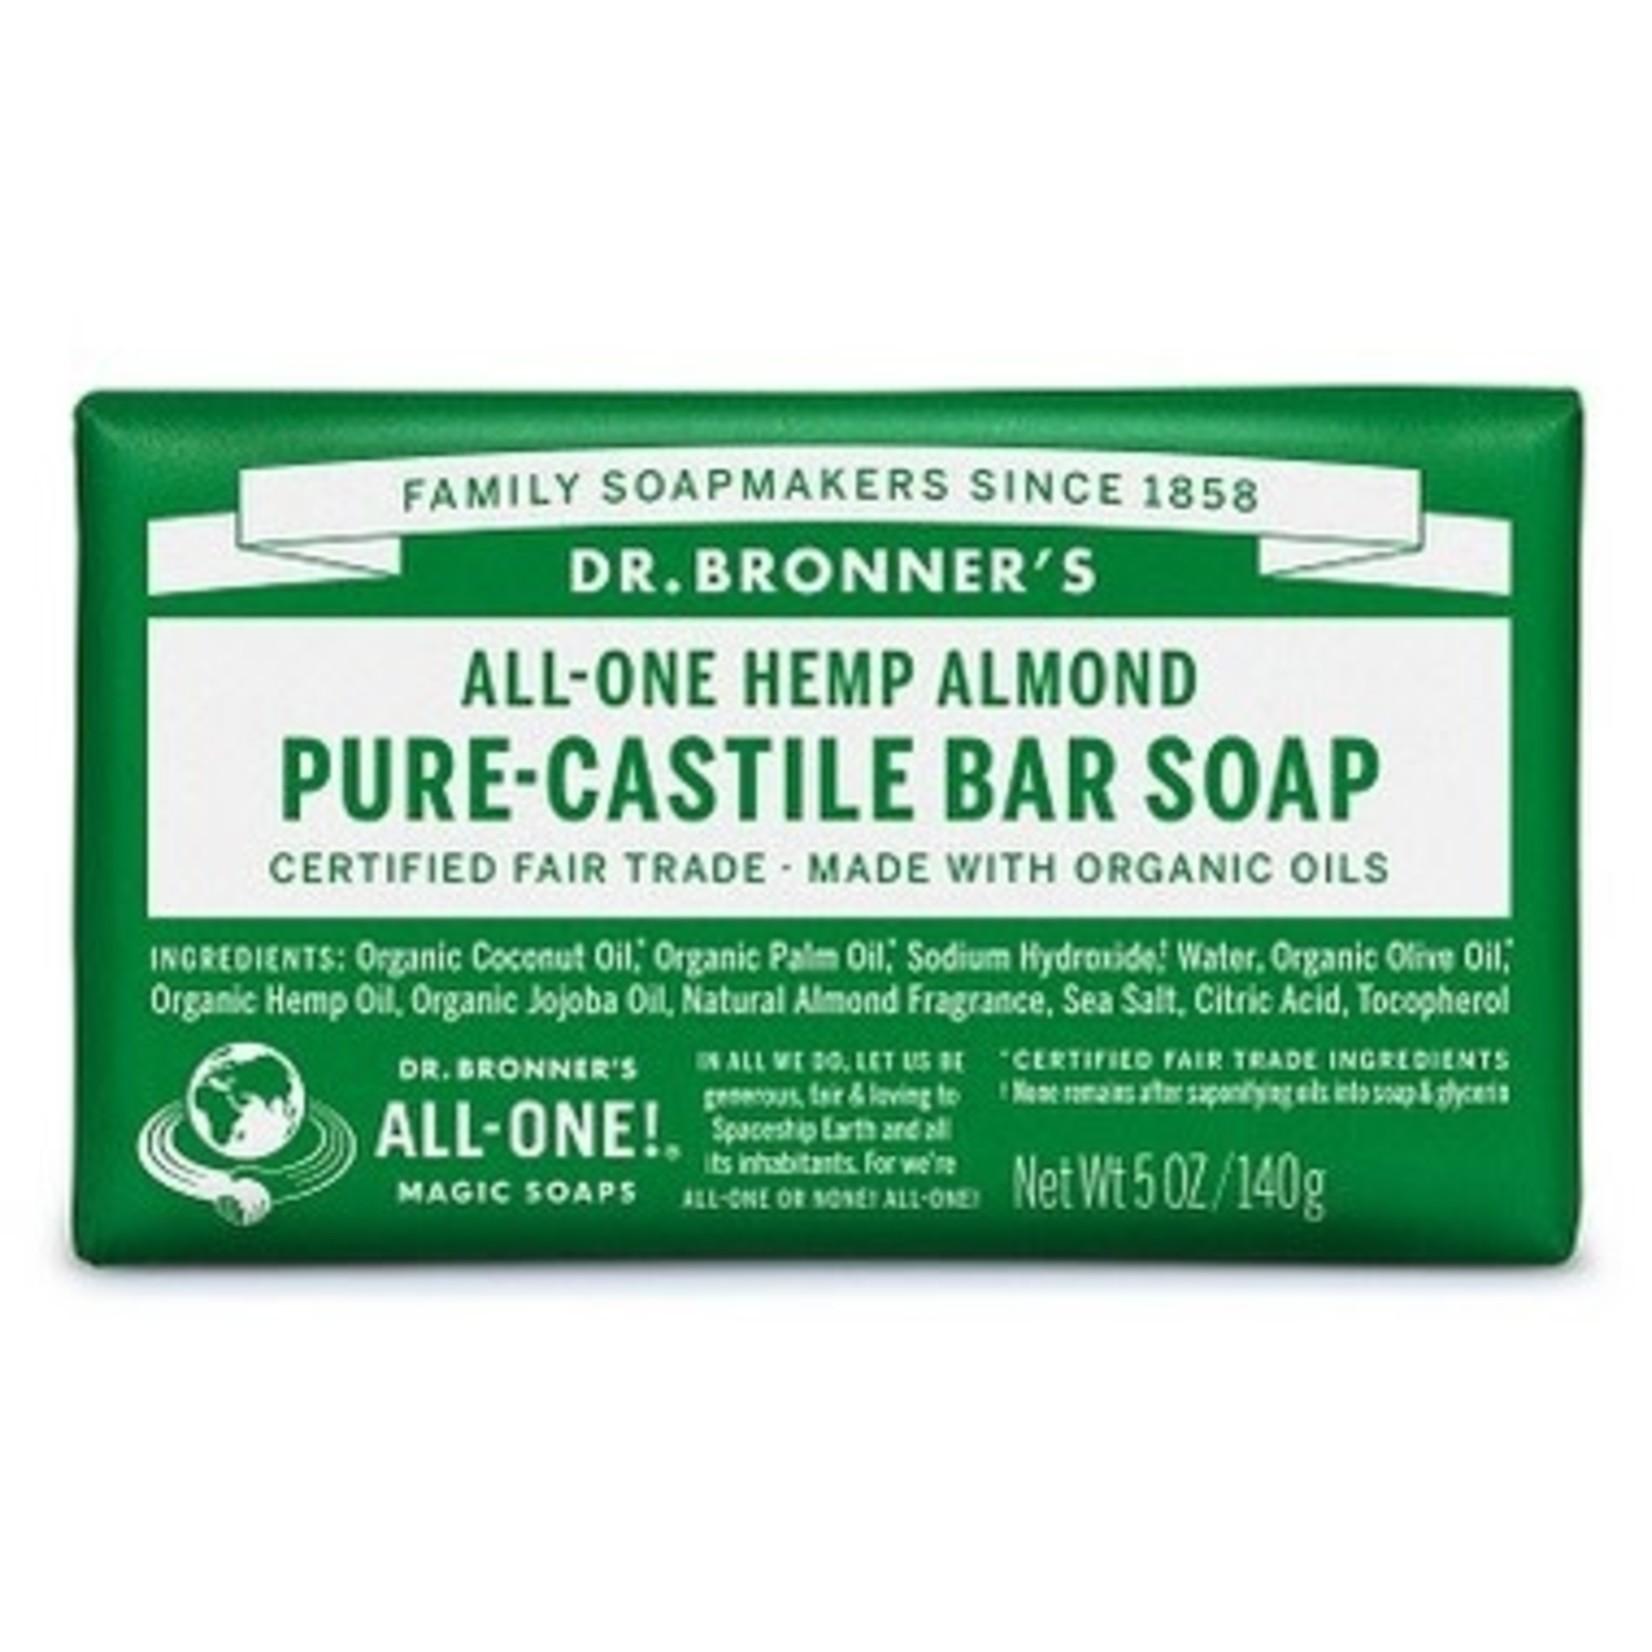 DR. BRONNER'S Pure-Castile Bar Soap - Almond